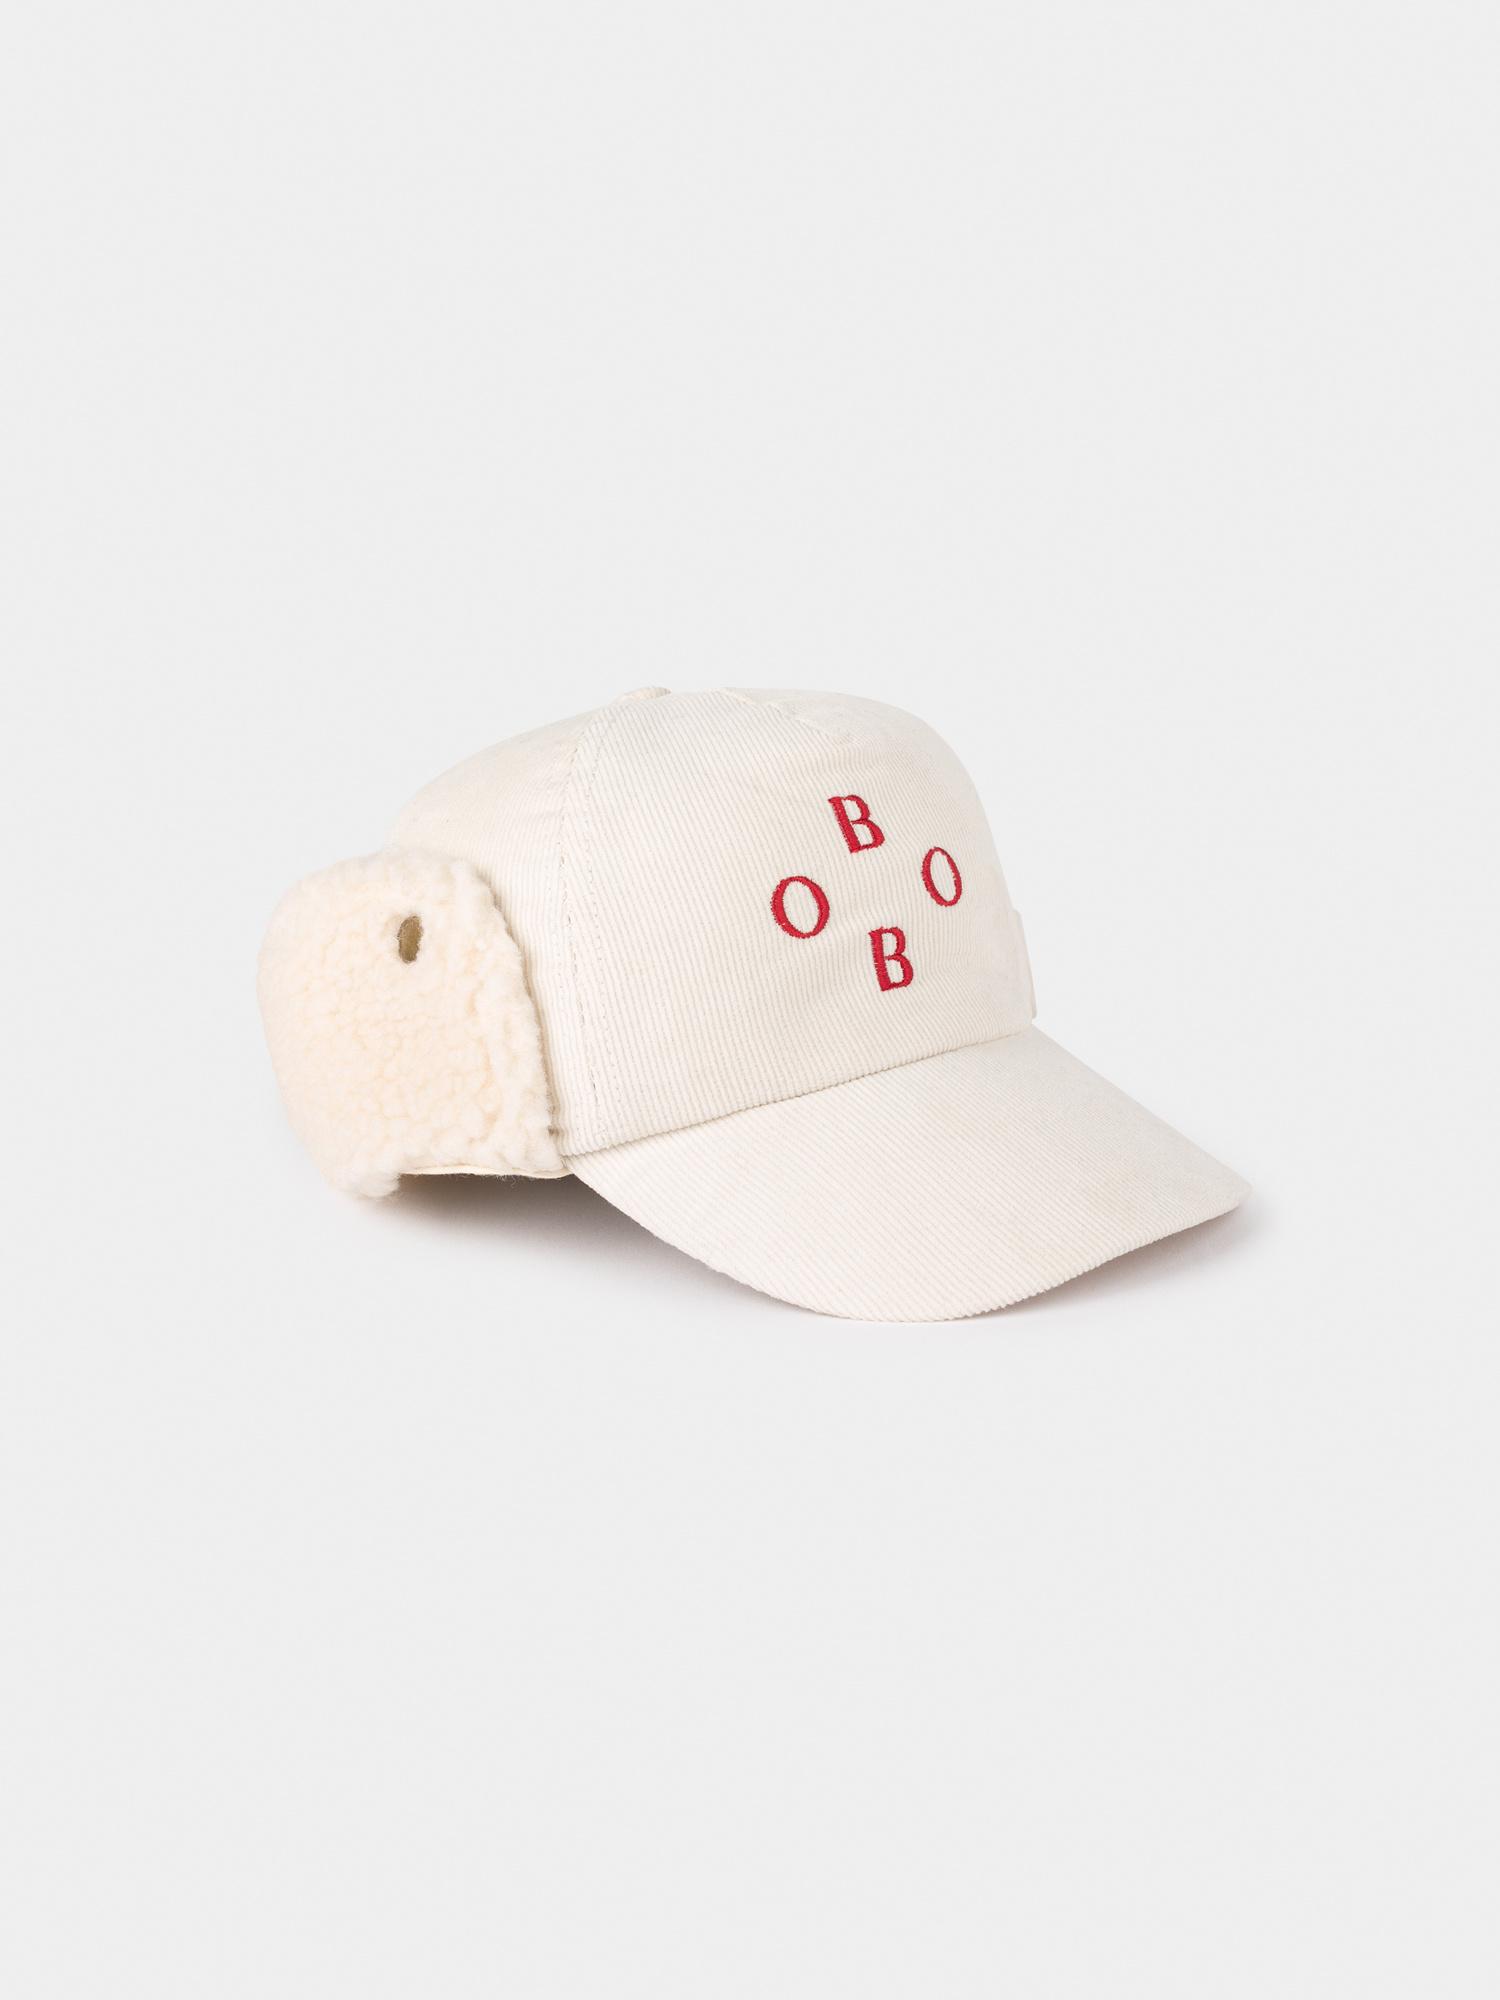 Bobo Sheepskin Cap-1